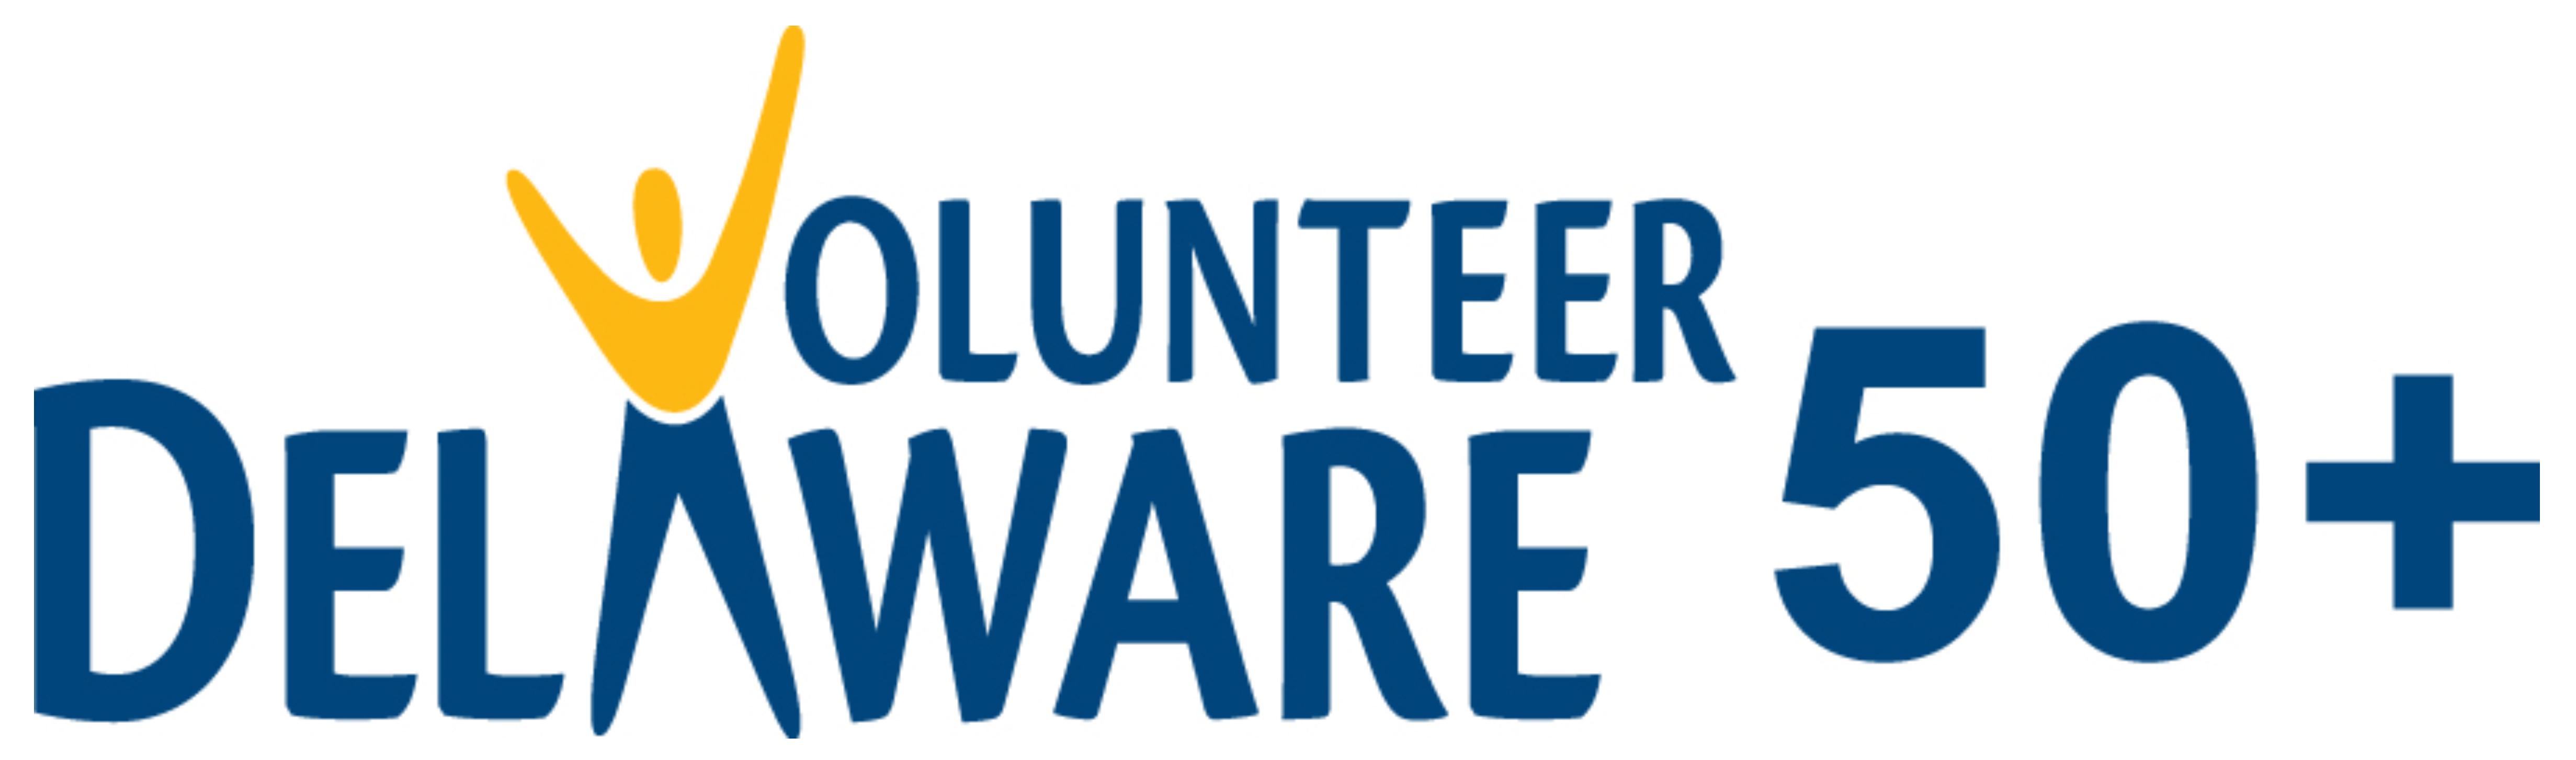 Volunteer Delaware | Opportunity Detail